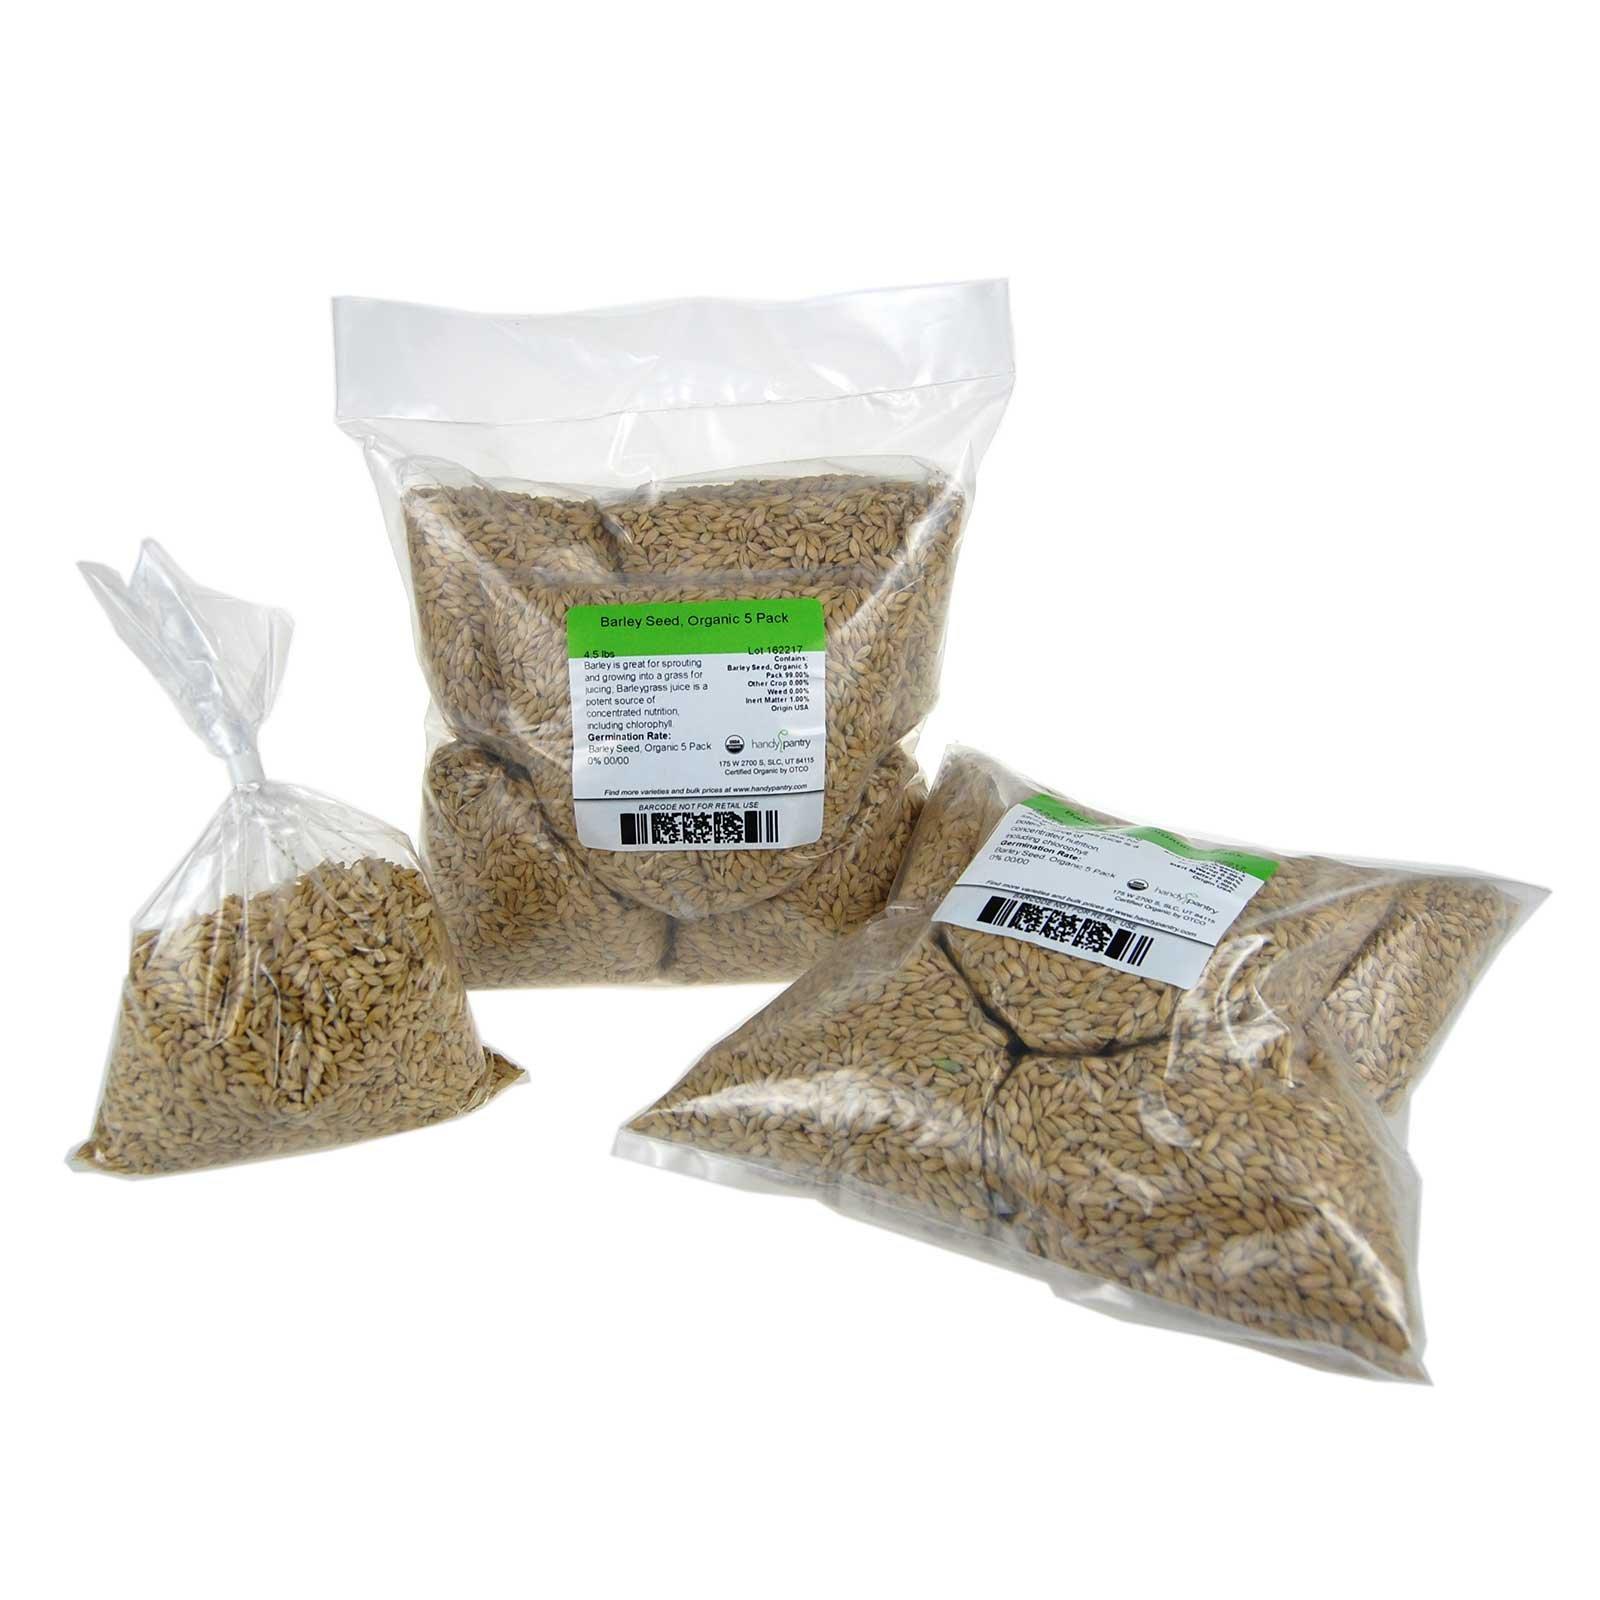 Organic Barley Seeds - 9 Lbs in Pre-Measured Bags for 10x20 Trays - Whole (Hull Intact) Barleygrass Seed - Ornamental Barley Grass, Juicing